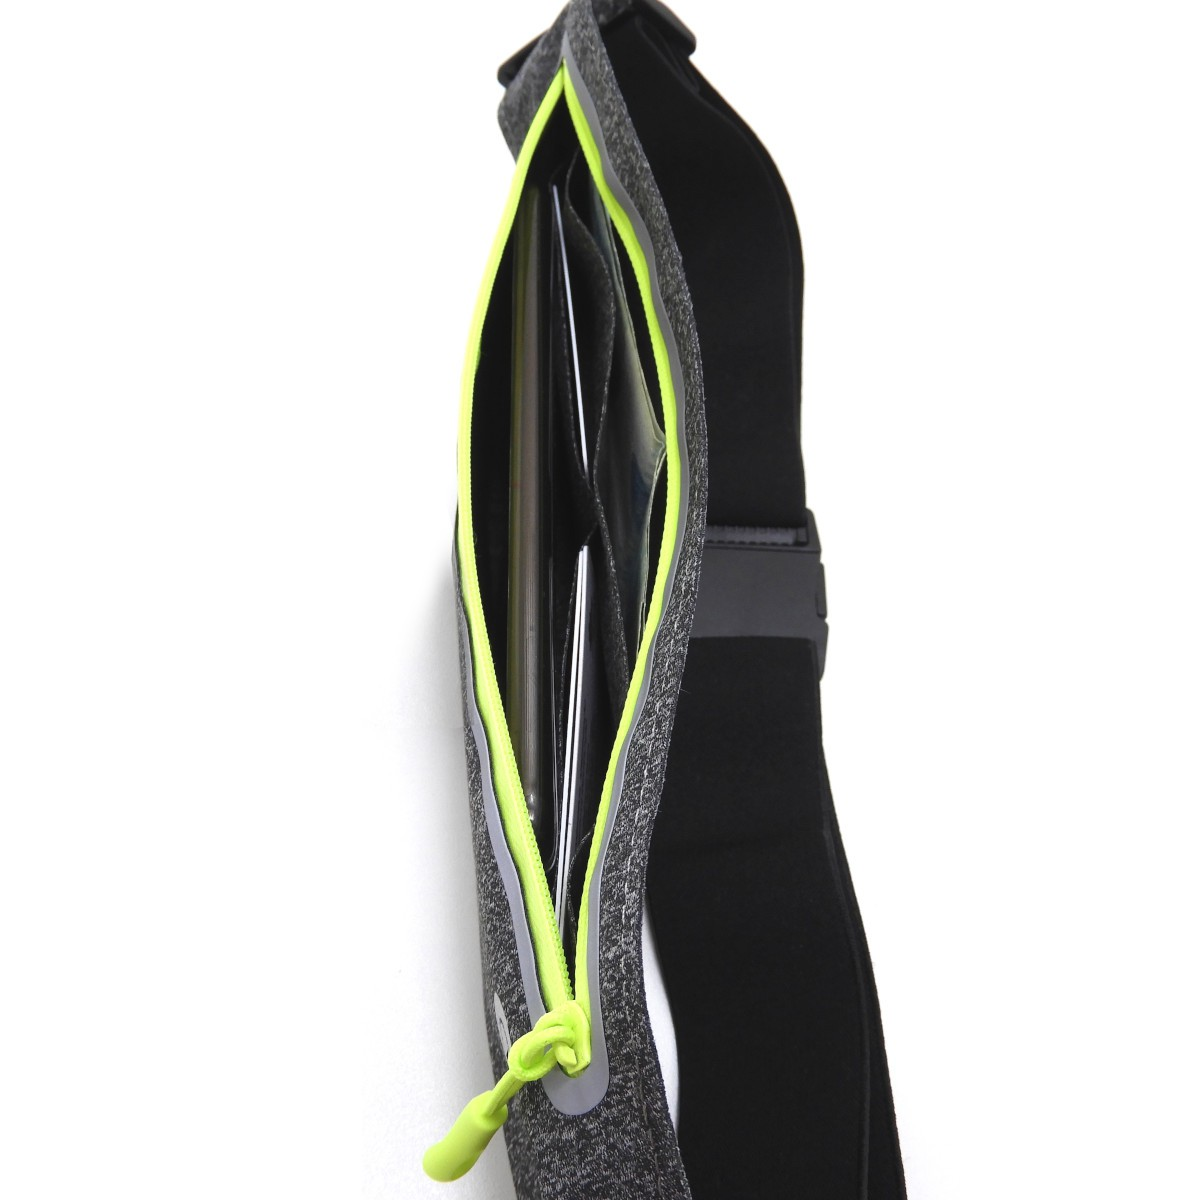 Pochete esportiva Ultra Slim Impermeável para Celular até 6.3 polegadas Kimaster AR80 Cinza